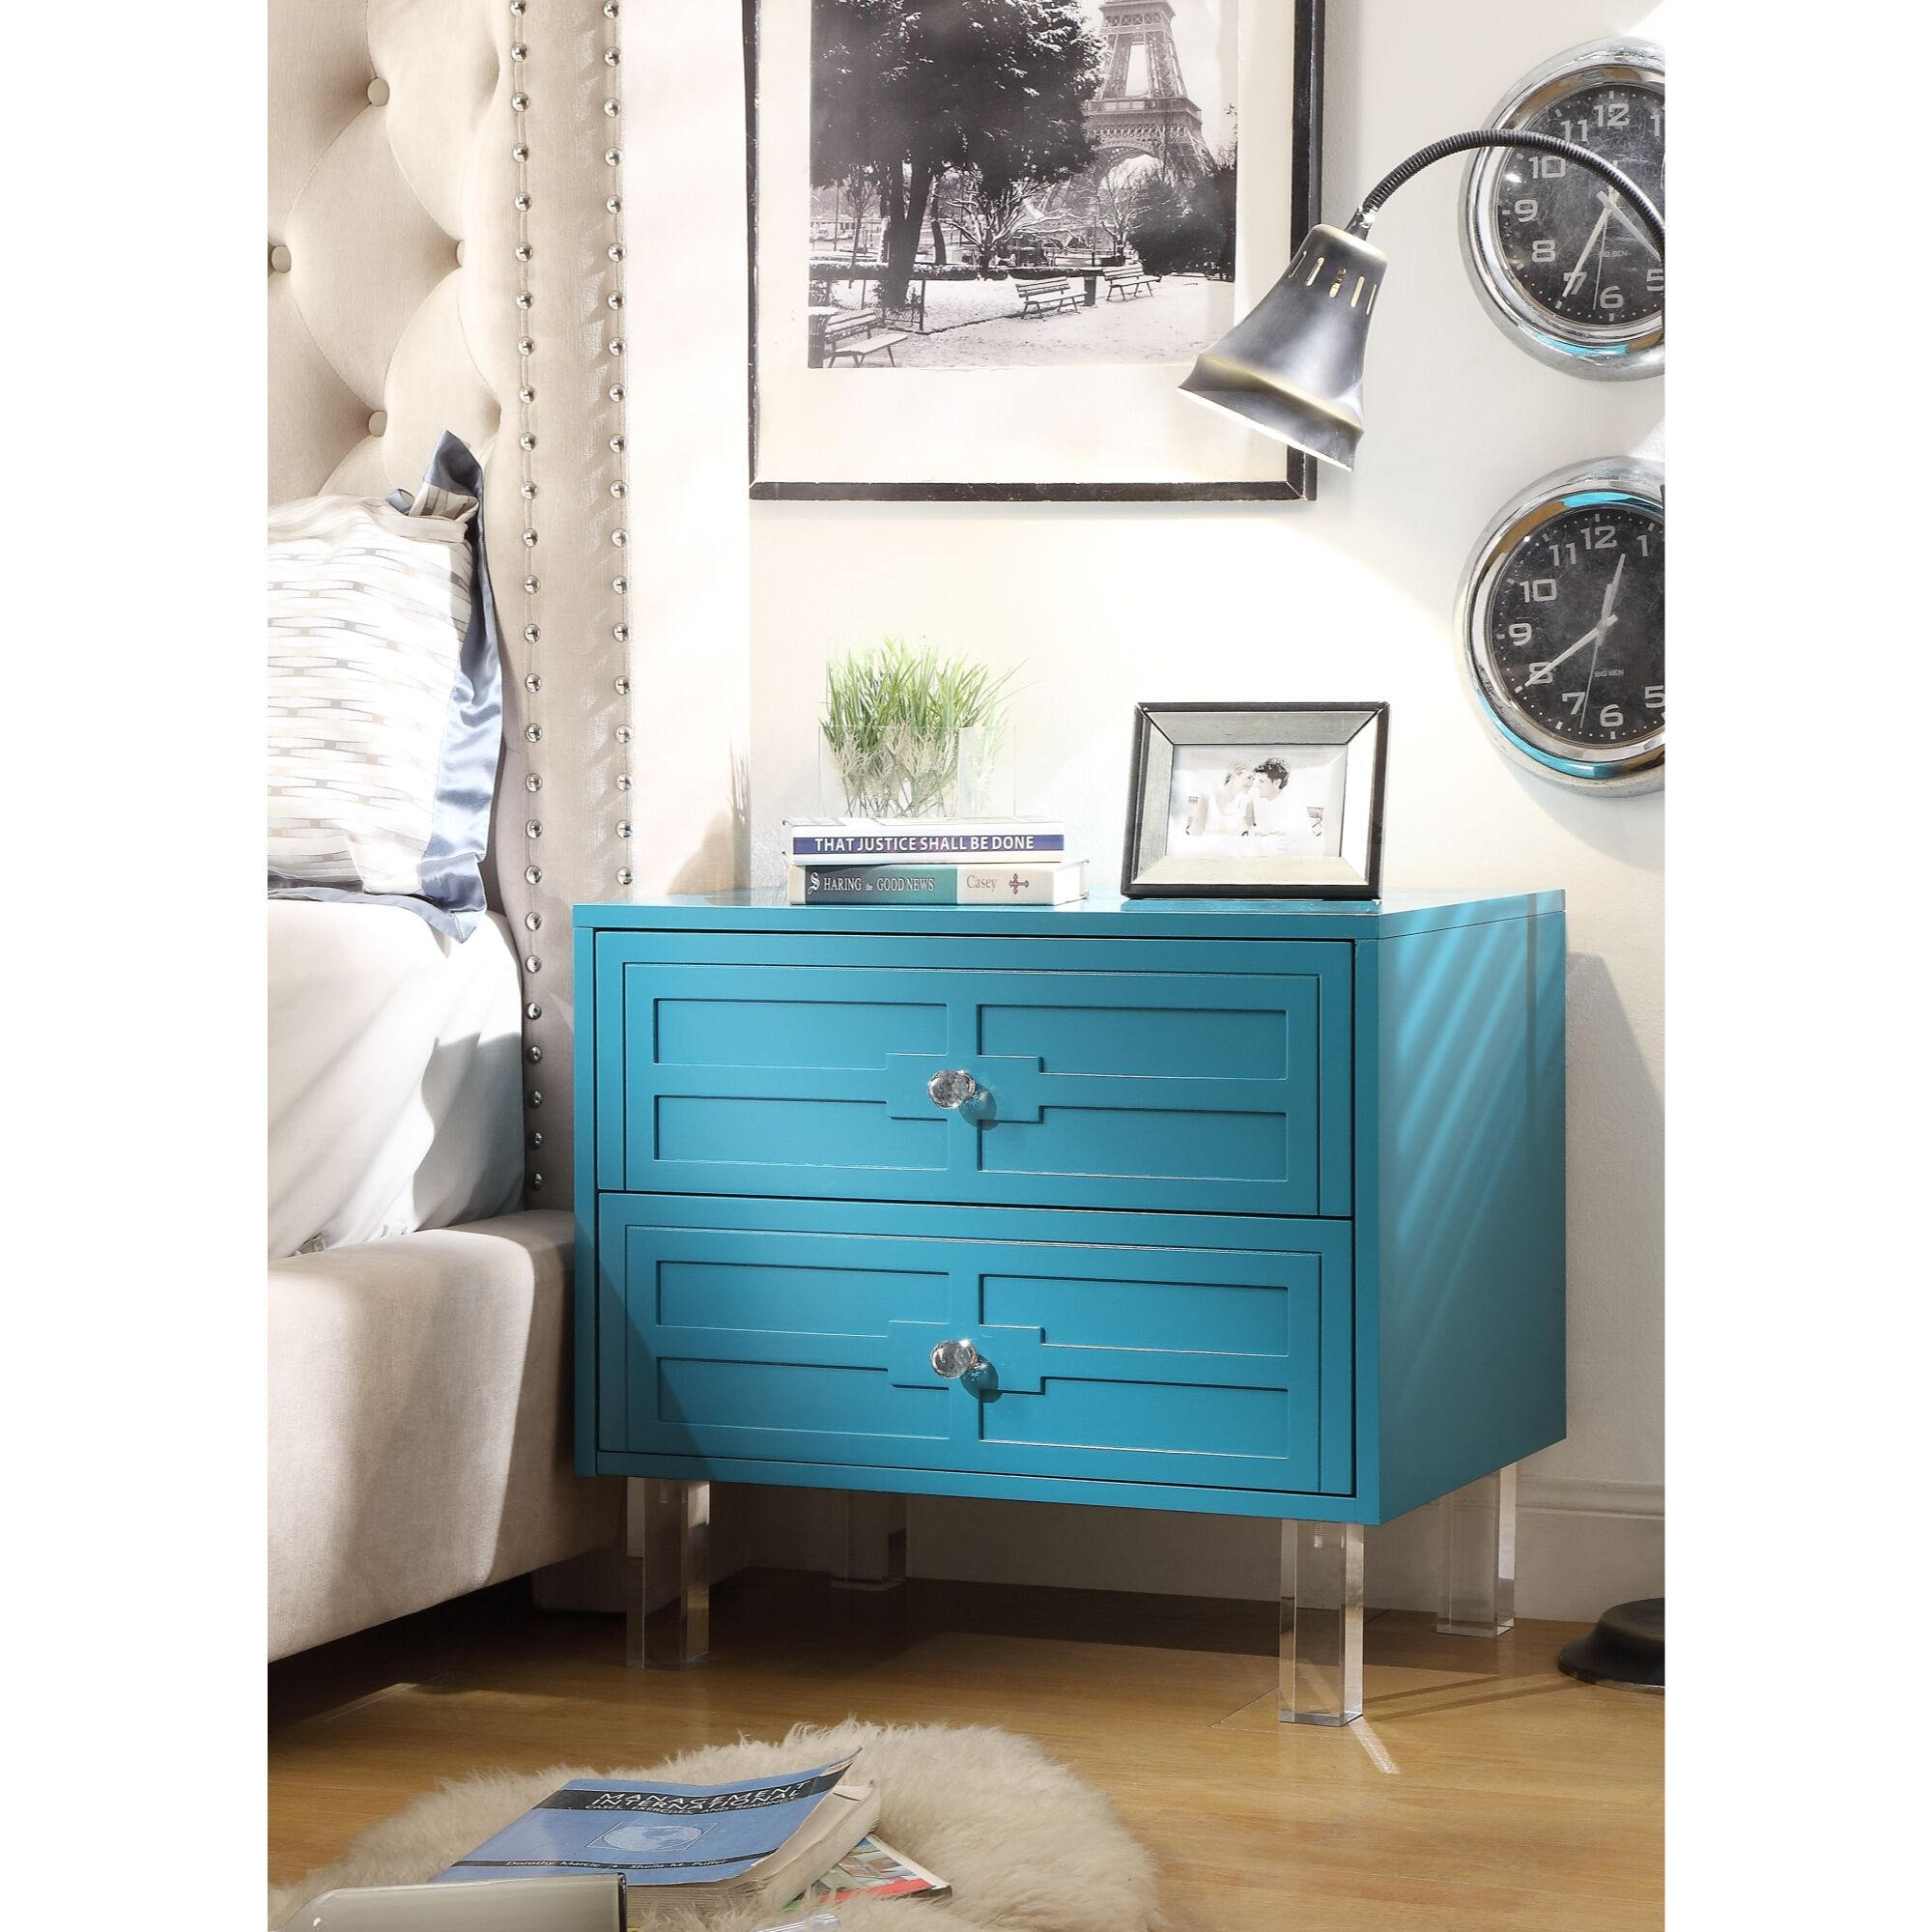 Admiranda 2 Drawer Nightstand Color: Turquoise